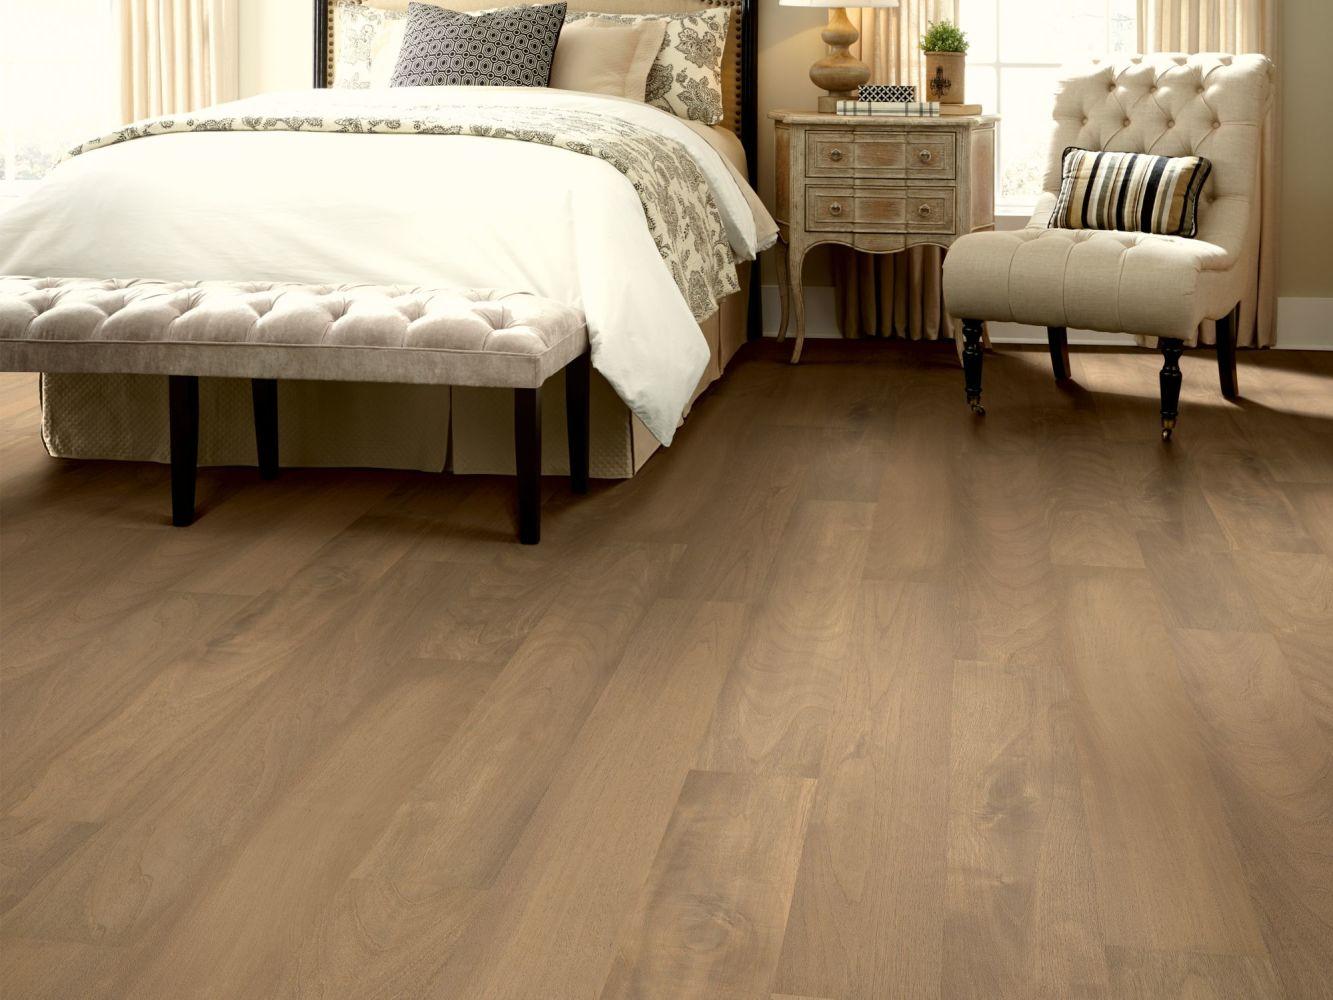 Shaw Floors Nfa HS Santa Maria Hdr Plus Mindful 06007_VH551